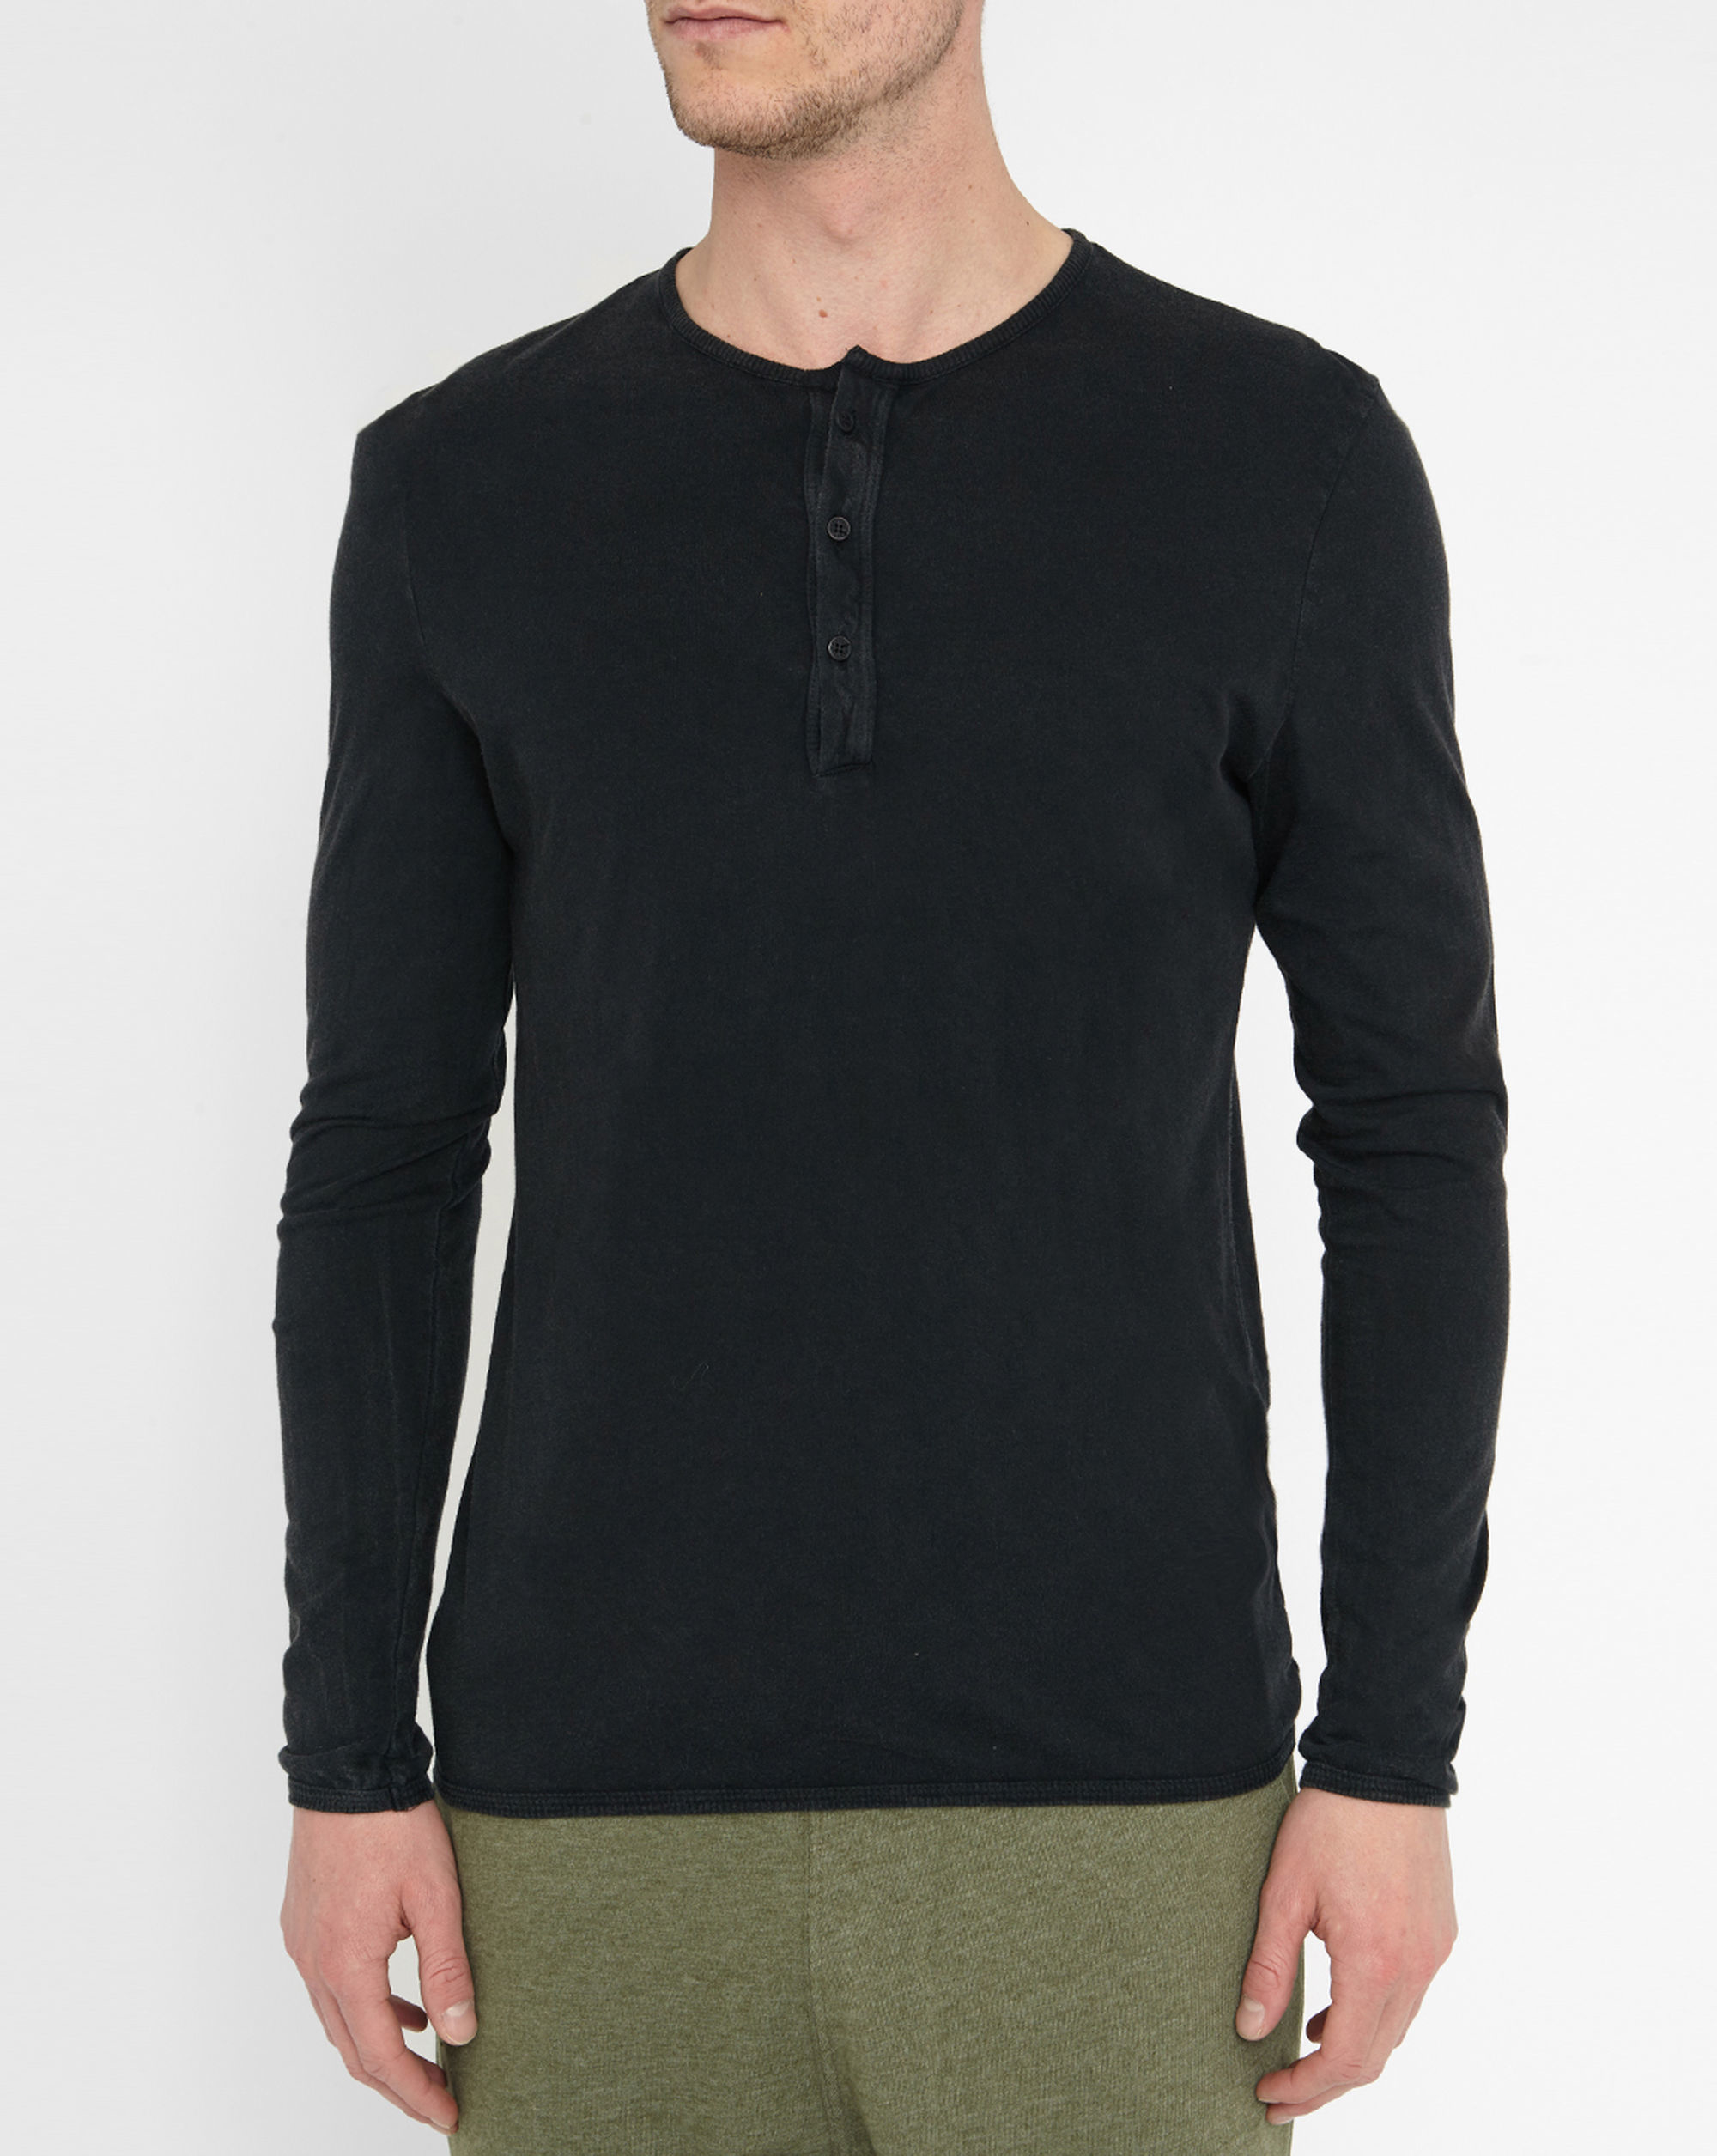 American vintage charcoal grandad collar t shirt in black Mens grandad collar shirt